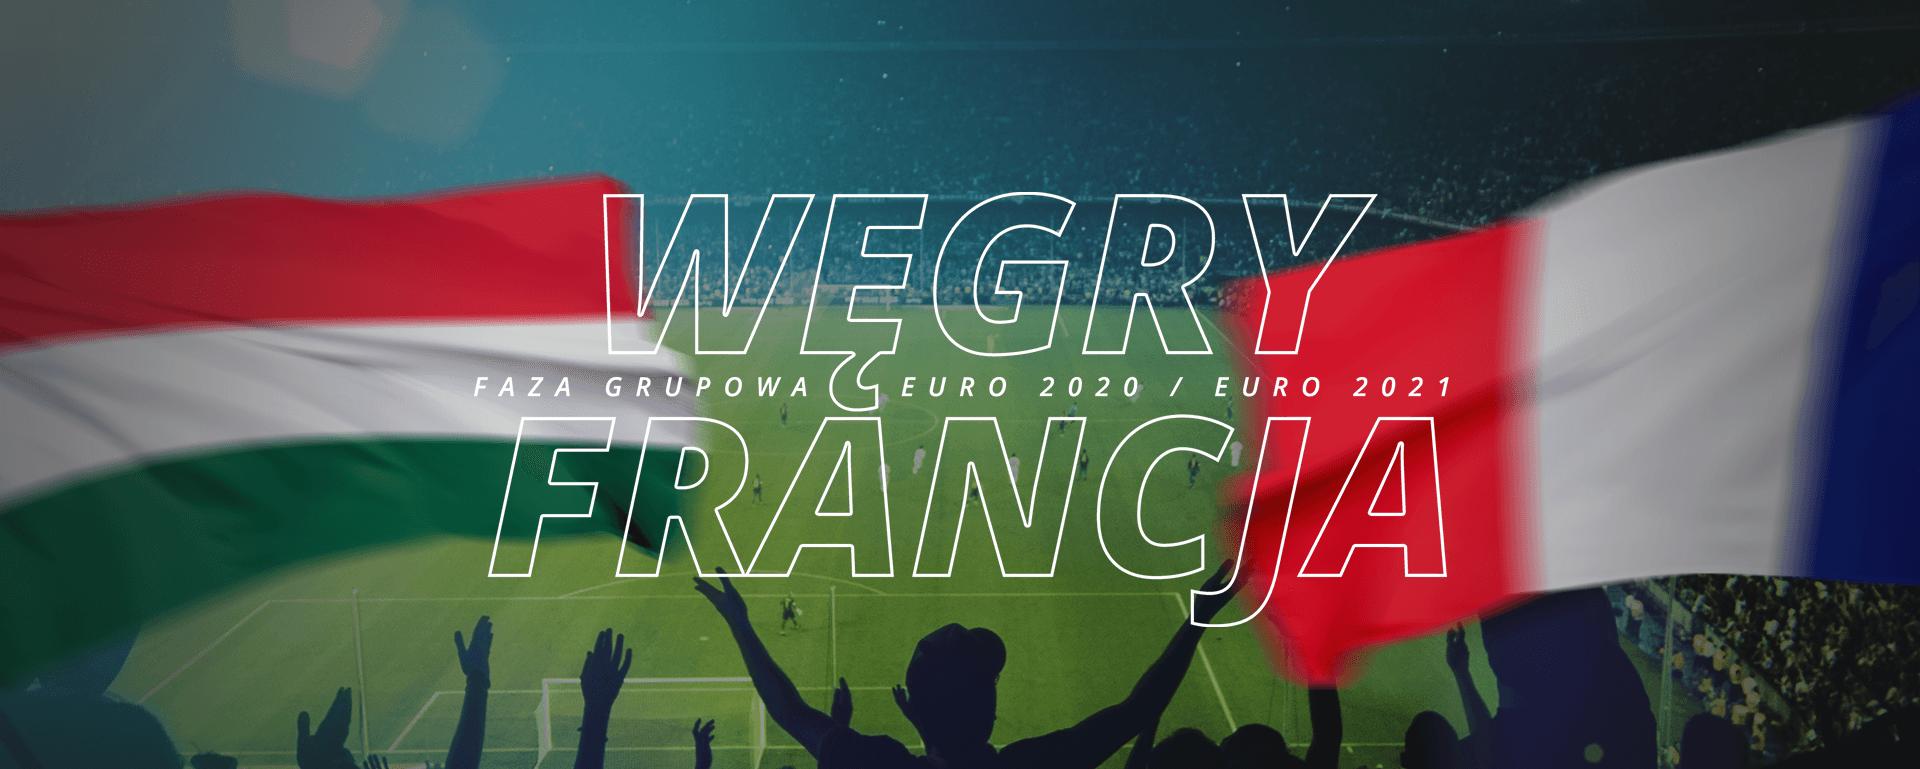 Węgry – Francja | faza grupowa Euro 2020 / Euro 2021